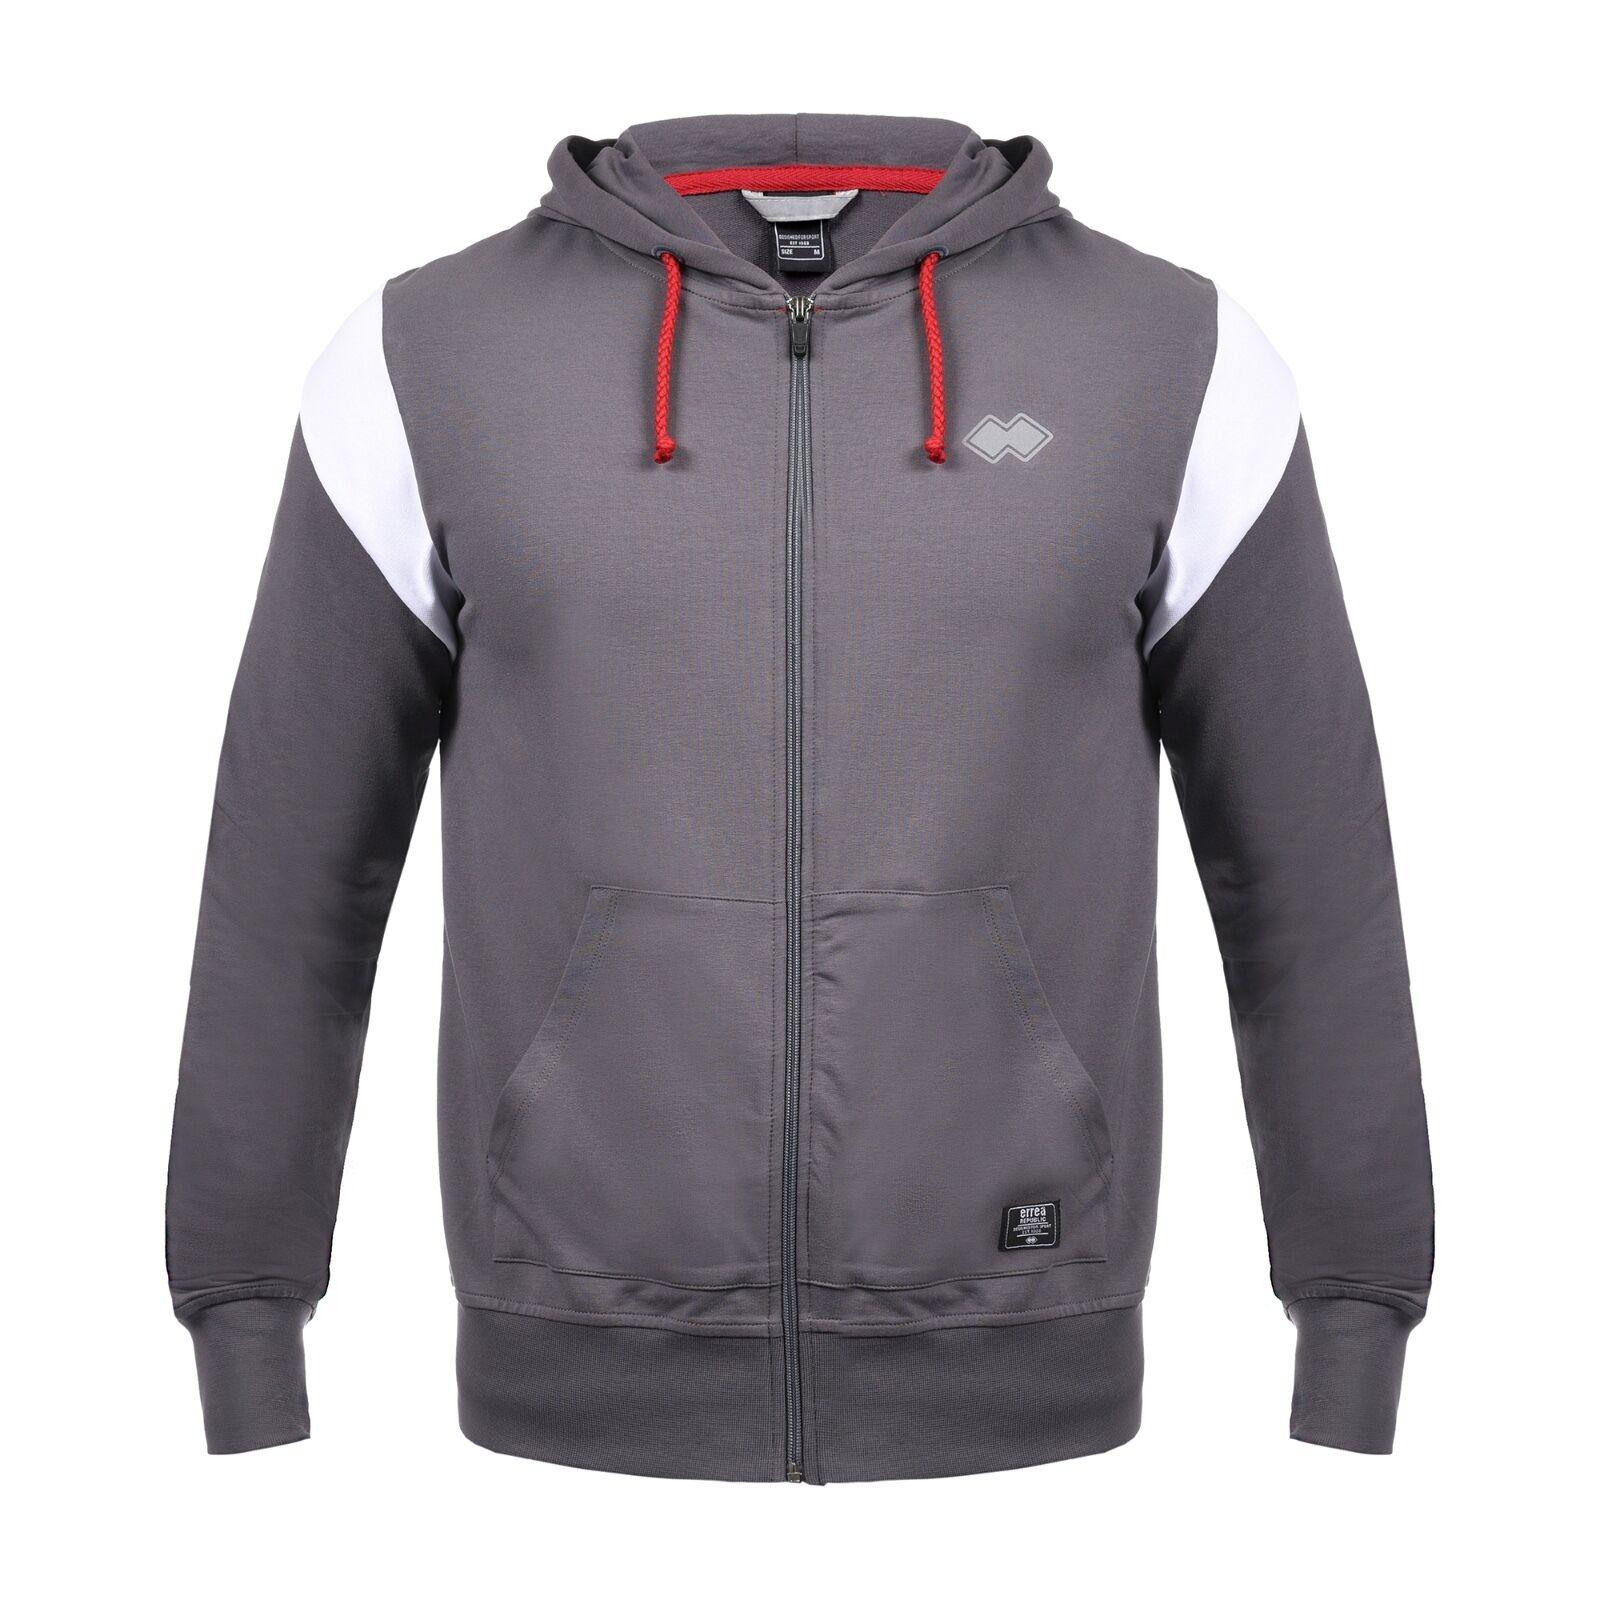 Errea' Republic Männer Pullover Trend R15G0M0Z26020 Far. Anthrazit Sommer 2017